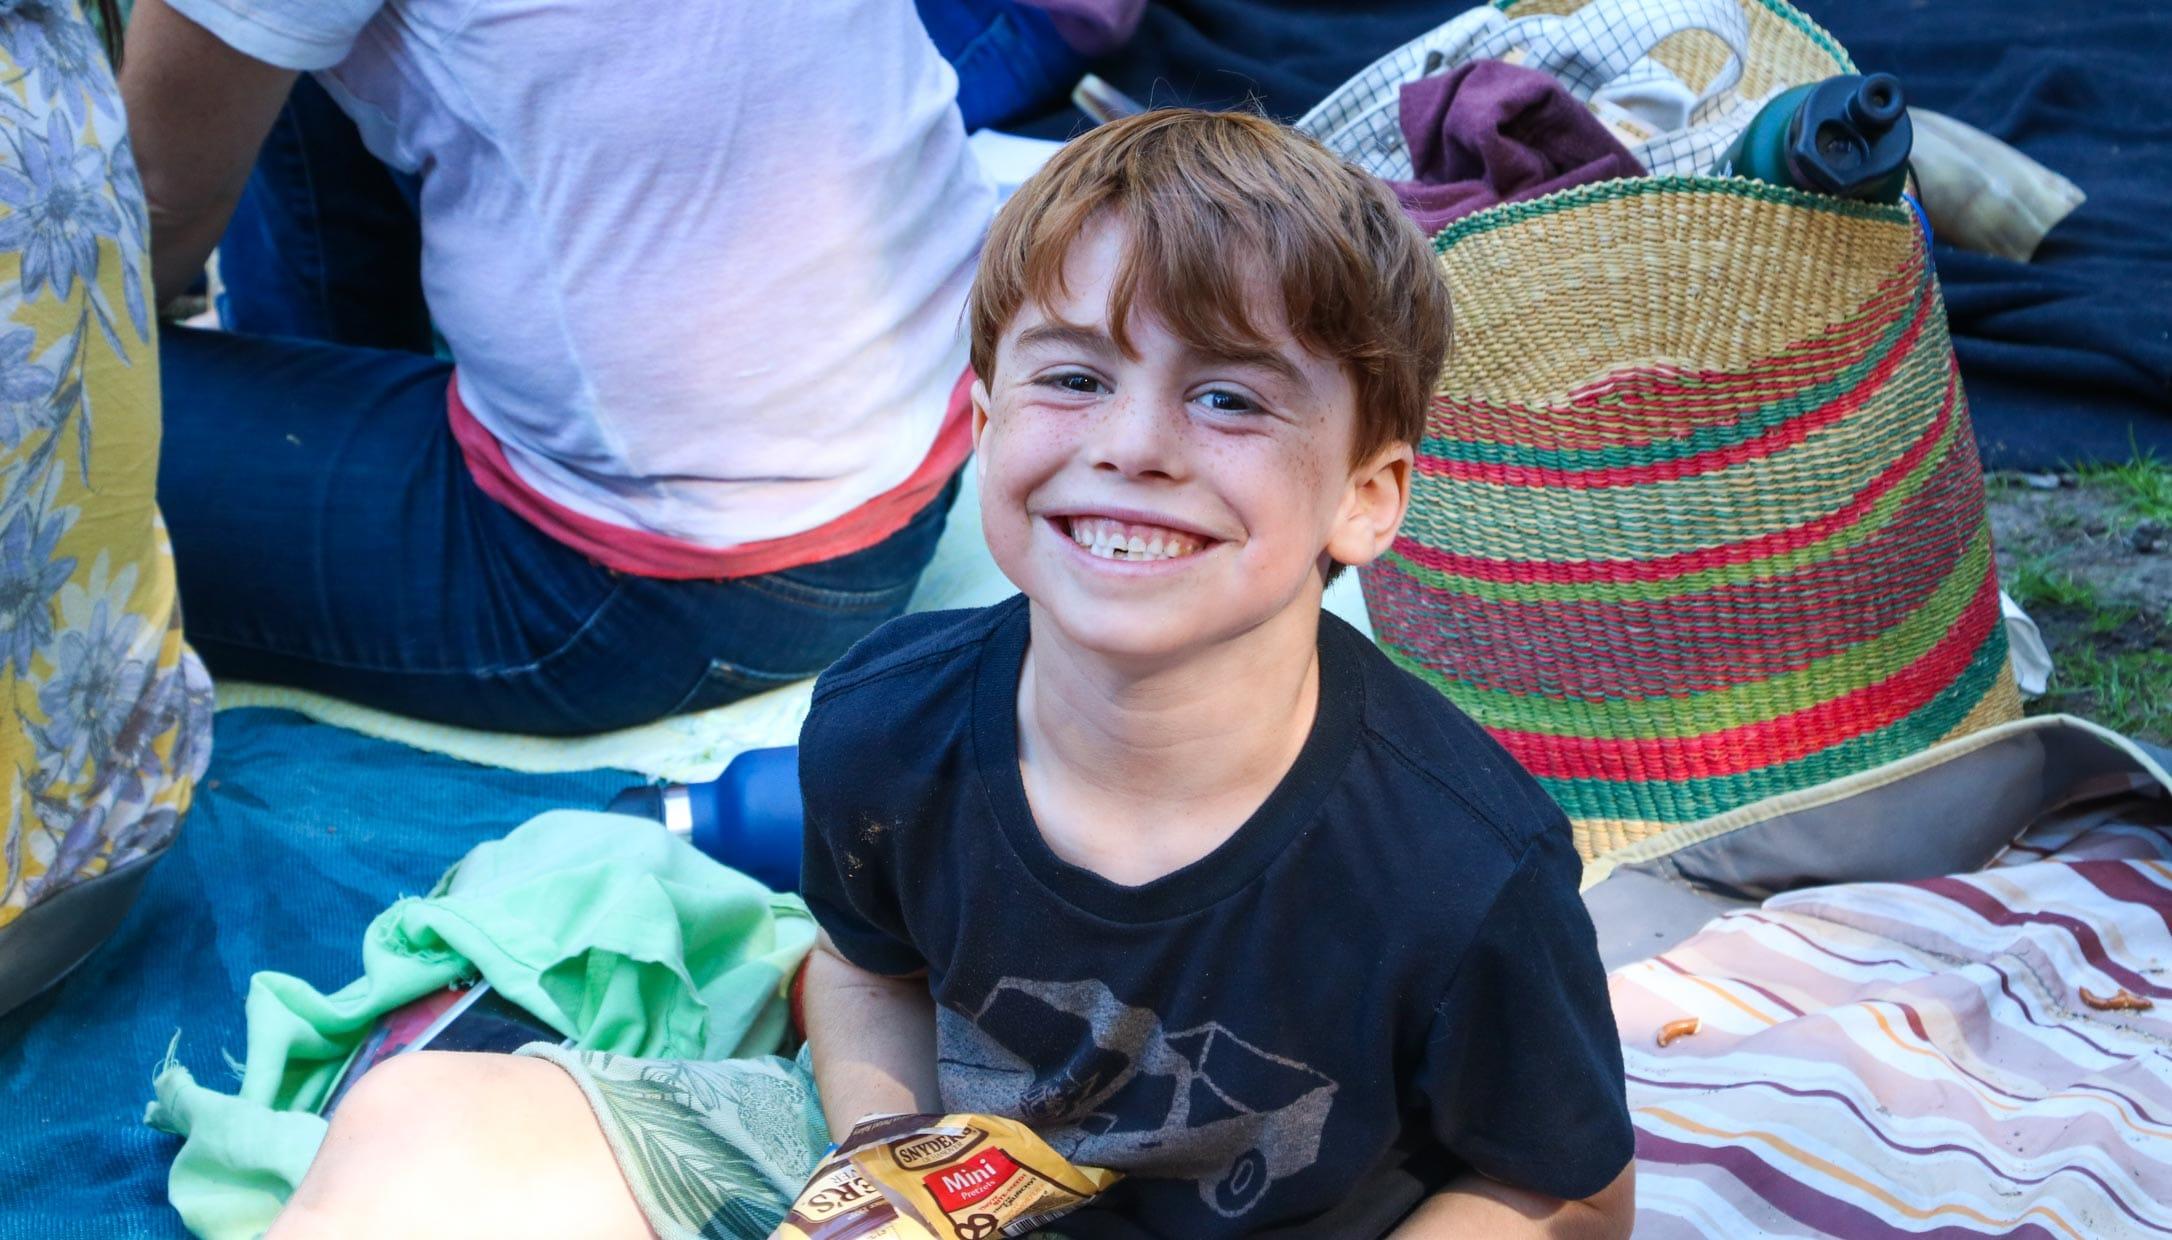 Boy attending a Erev Rosh Hashanah event